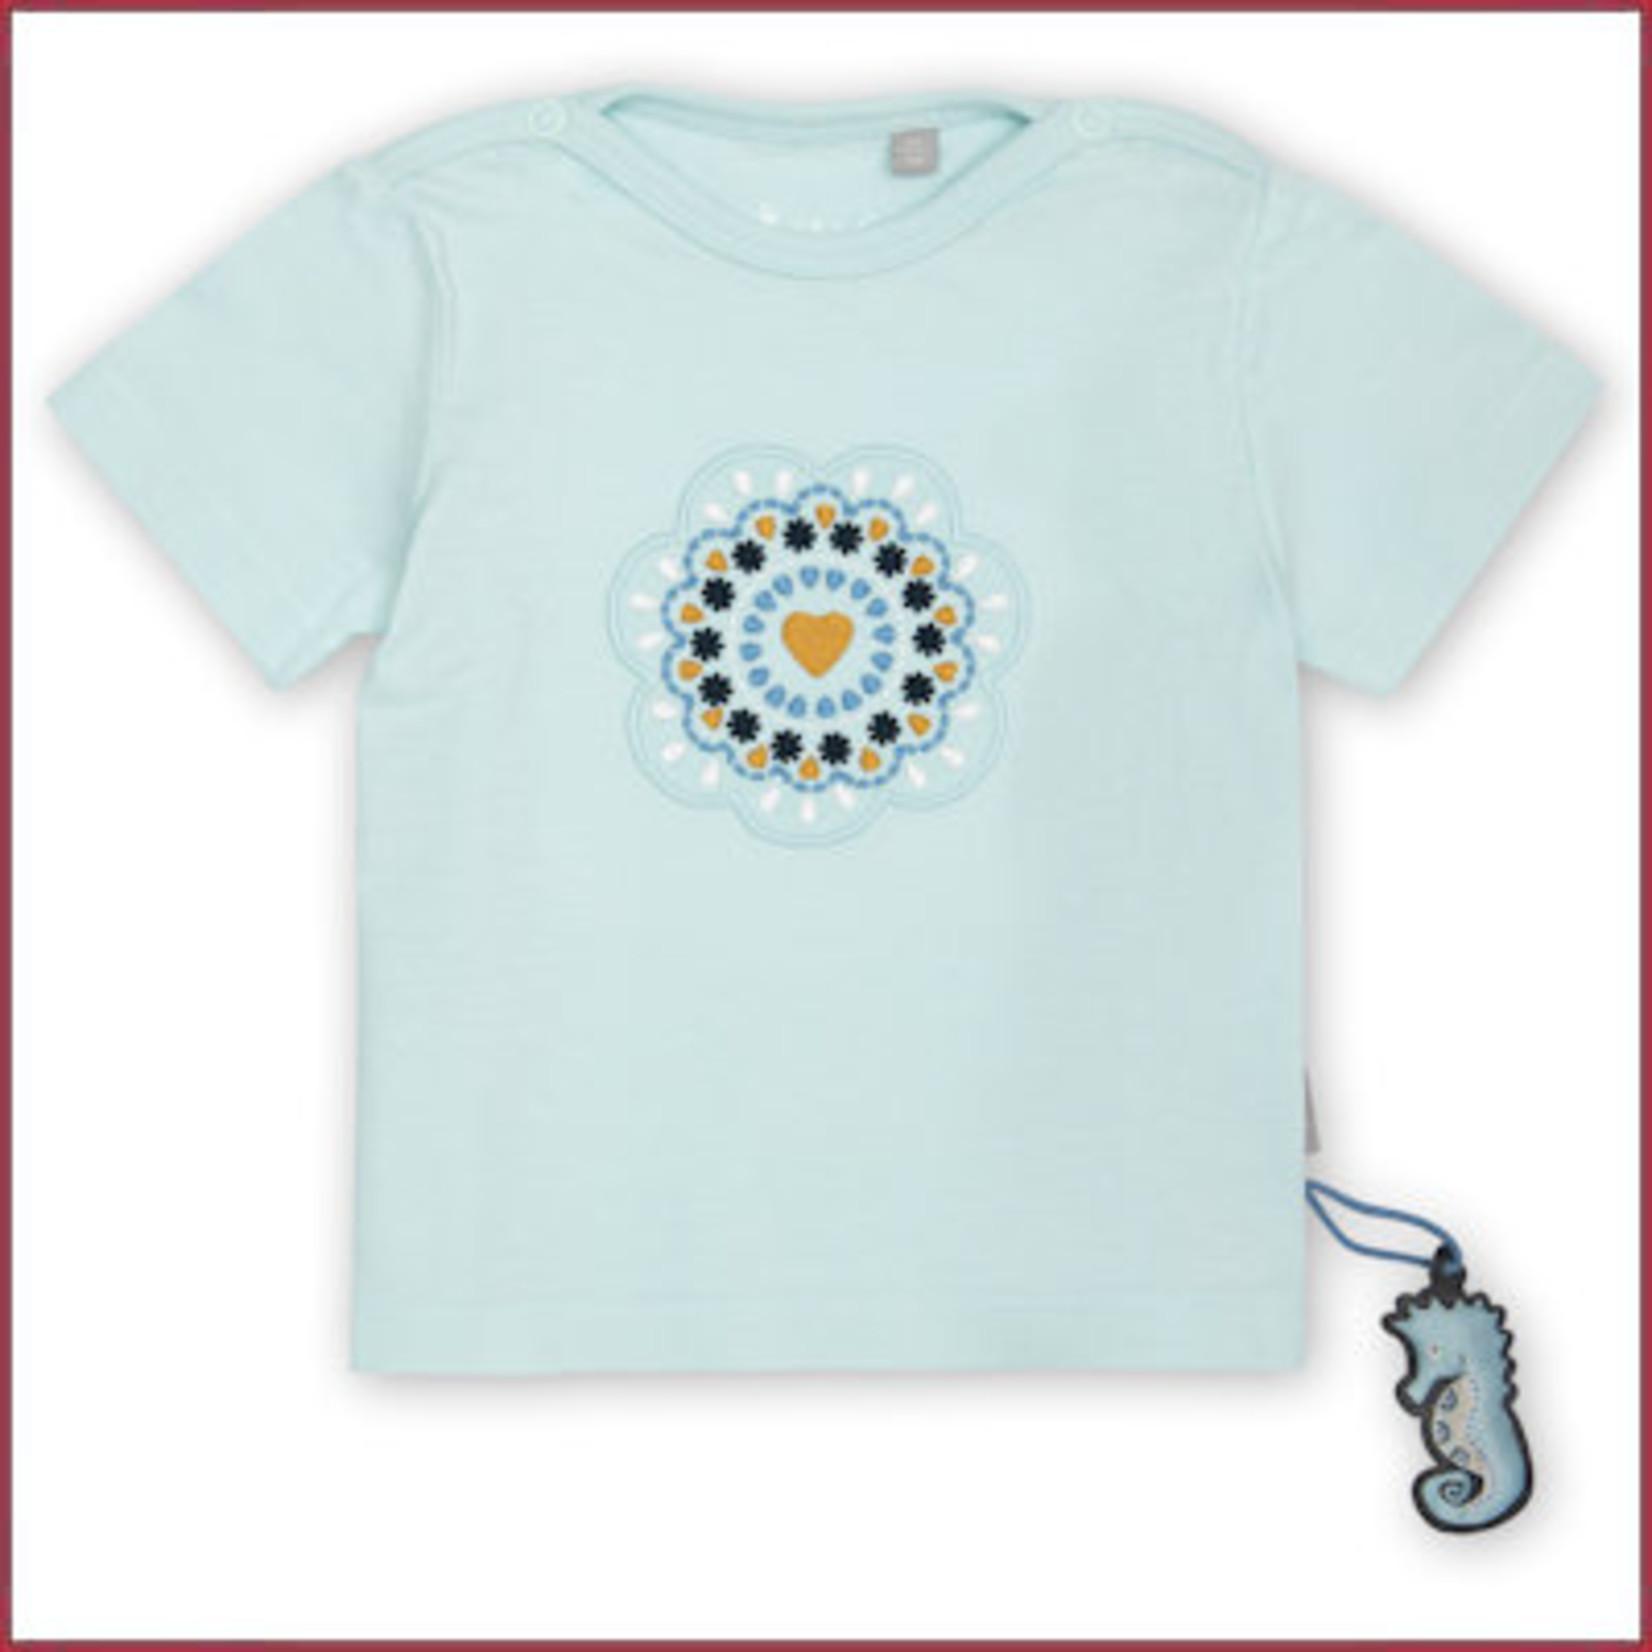 Sigikid T- shirt lichtblauw met borduursel hartje